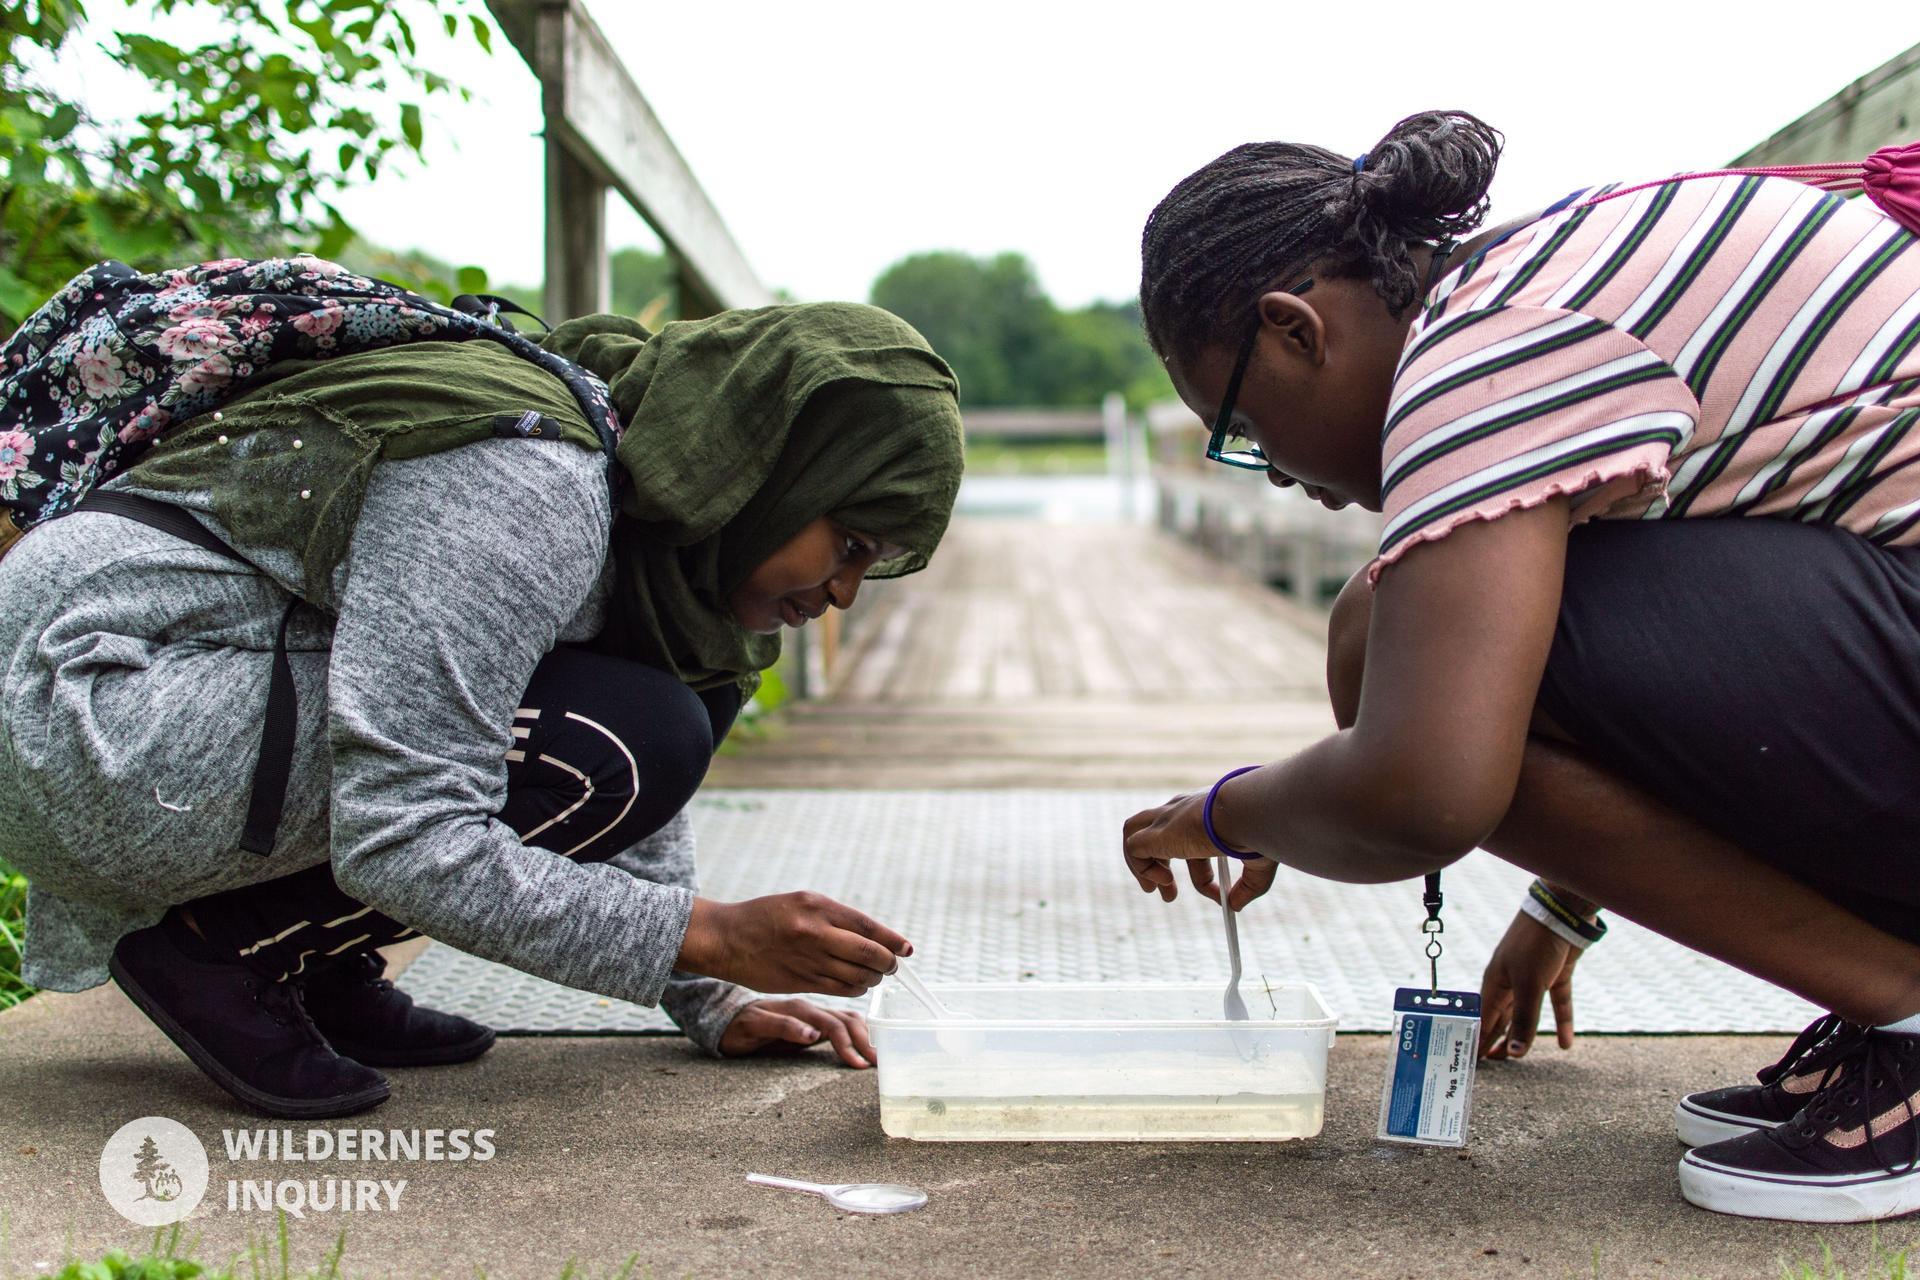 Scholars examining aquatic life